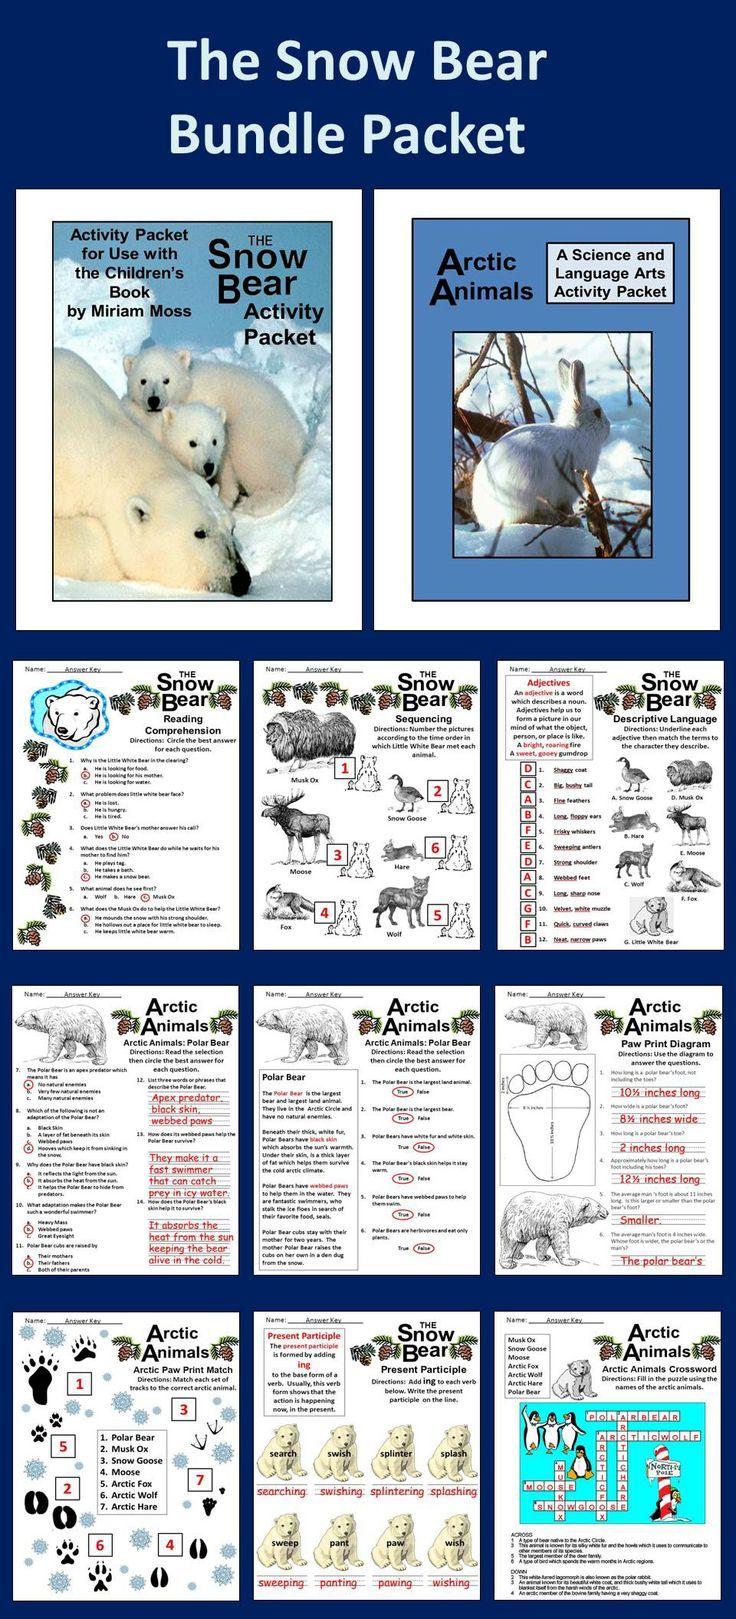 Winter Activities Animal Activities, Arctic Wolf and